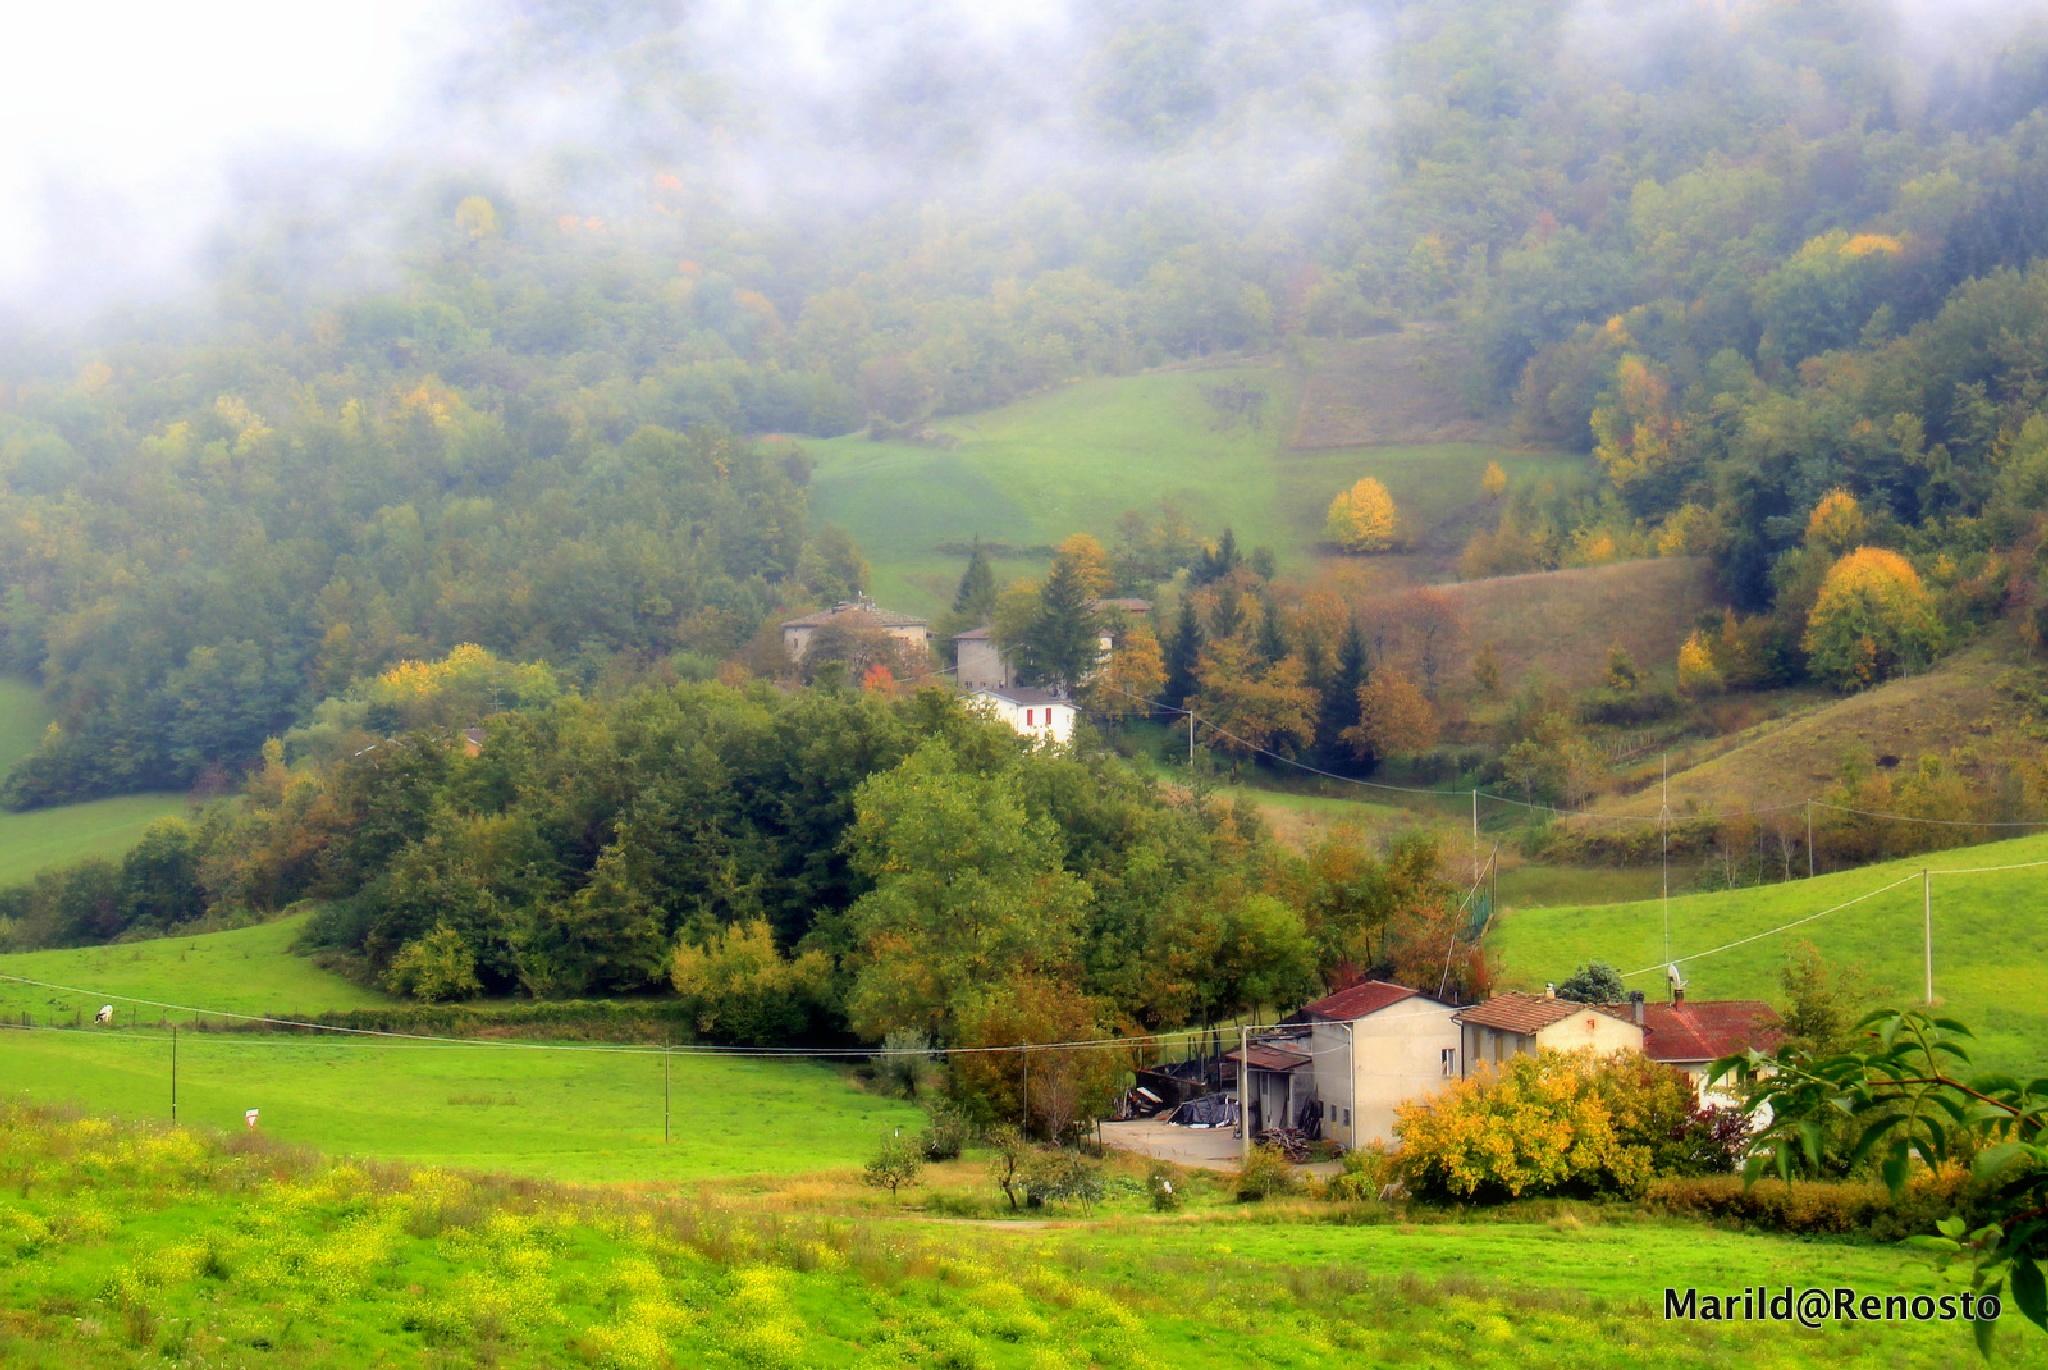 The beautiful Italy by marilda.renosto